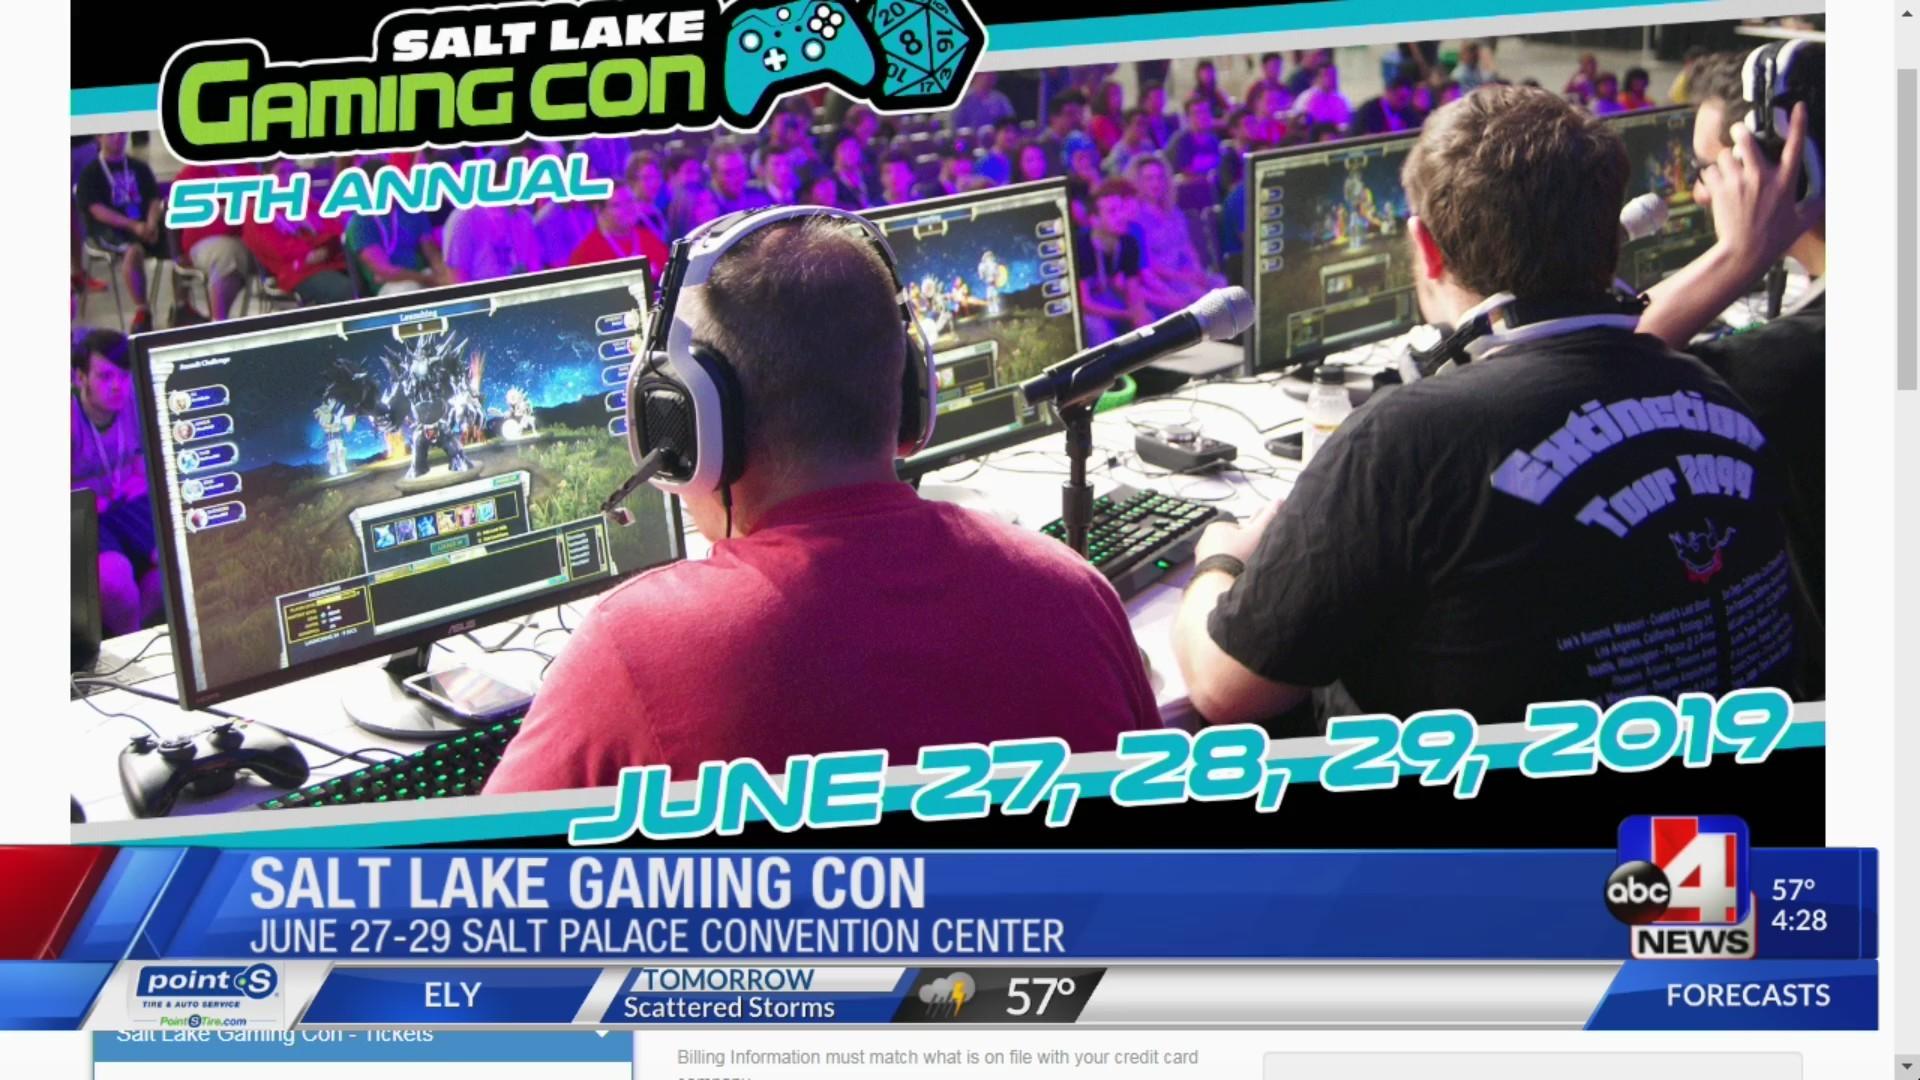 Life-size Mario Kart, Nerf wars and Esports at Salt Lake Gaming Con